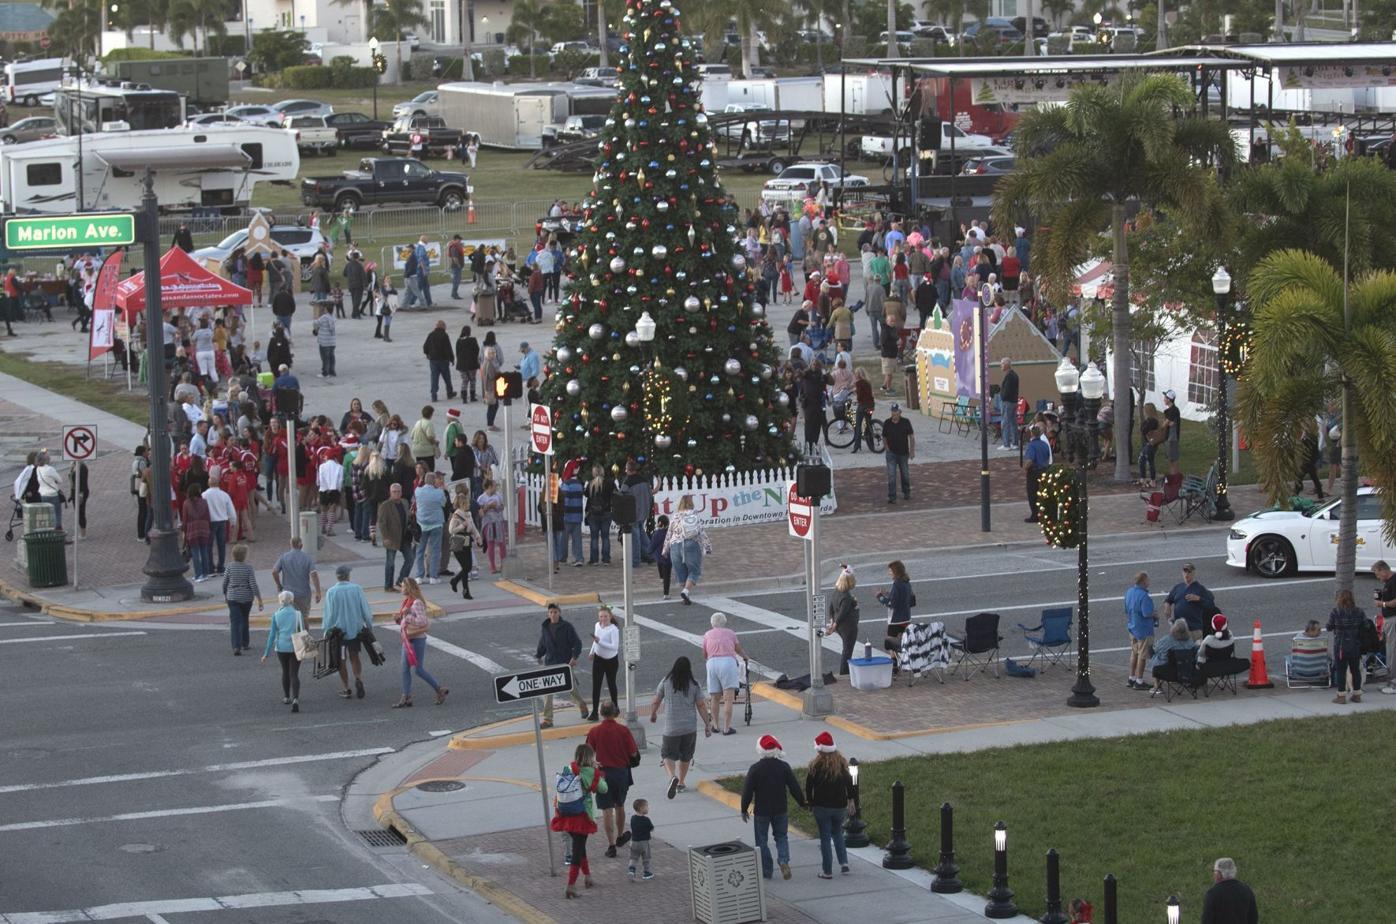 Historic Area Punta Gorda Halloween 2020 Halloween, Christmas events take hit in Punta Gorda over COVID 19